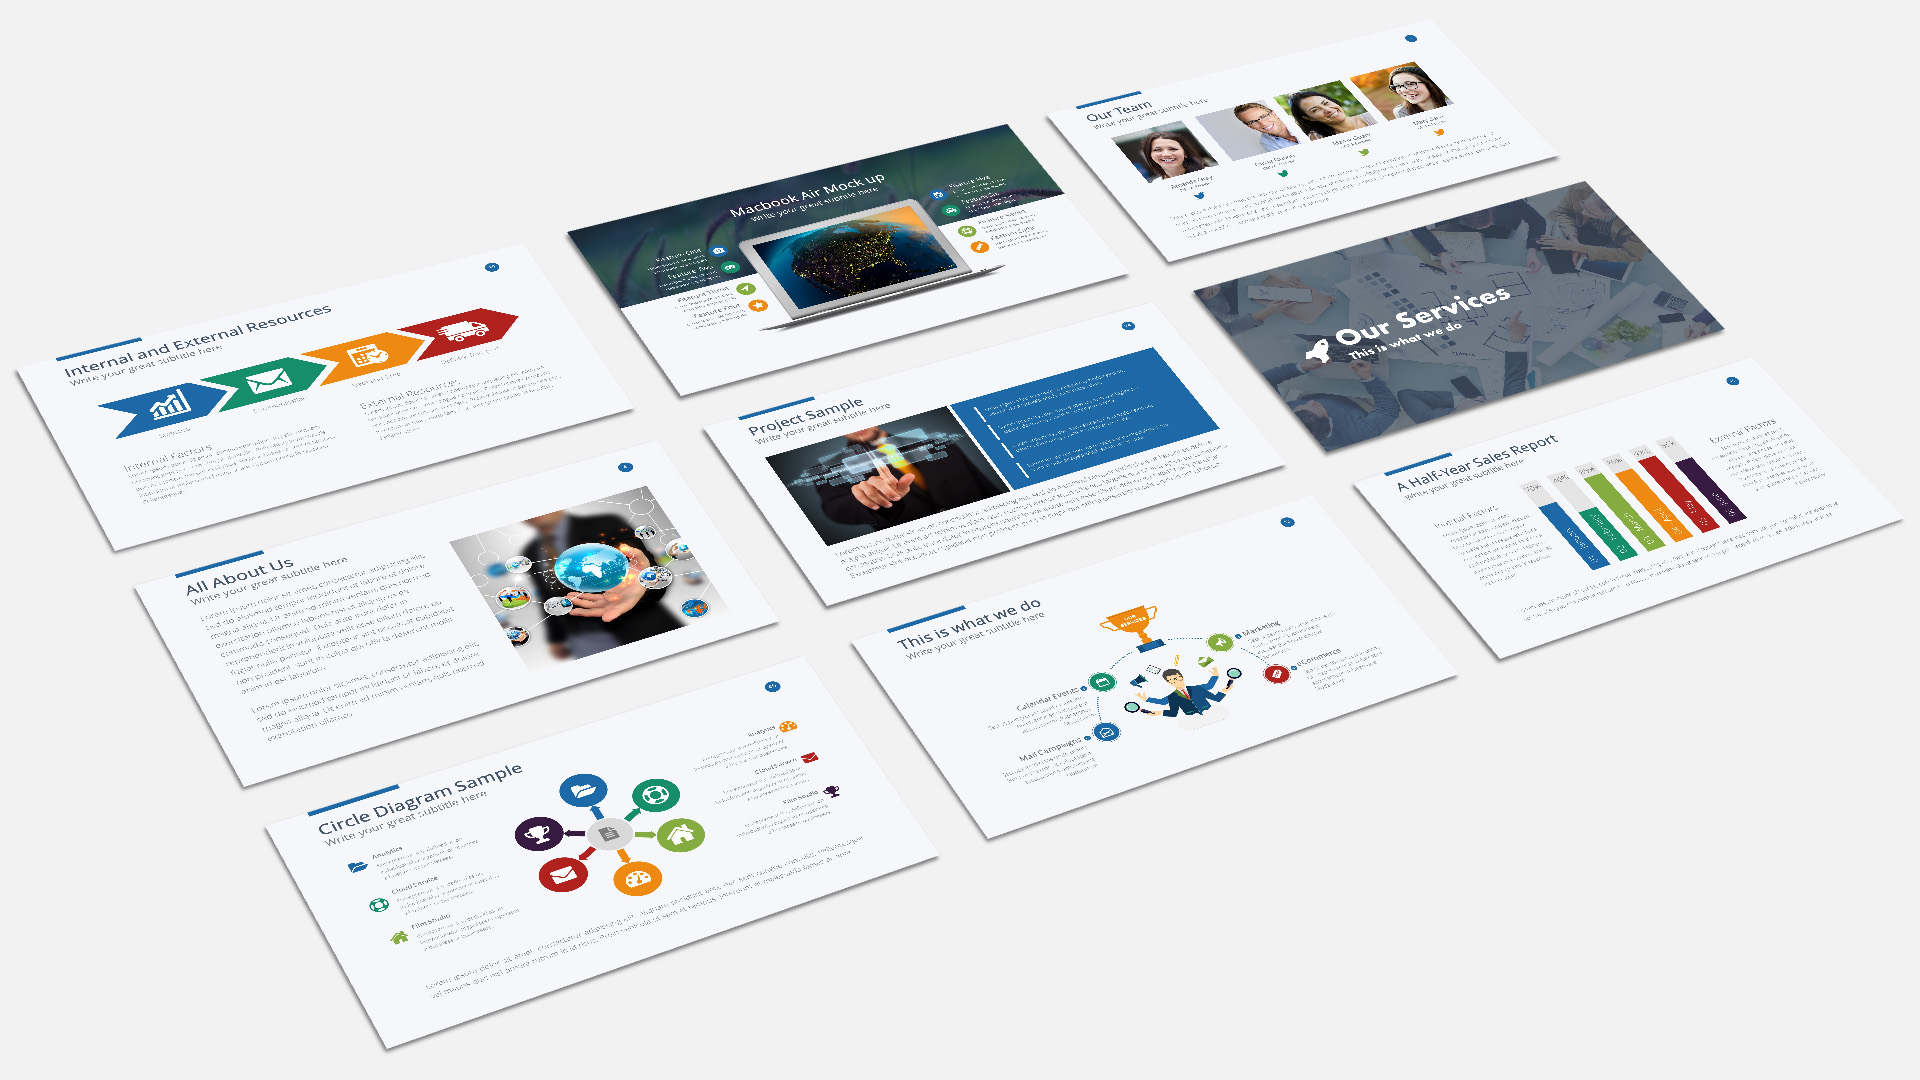 free-presentation-powerpoint-slides-mockup-template